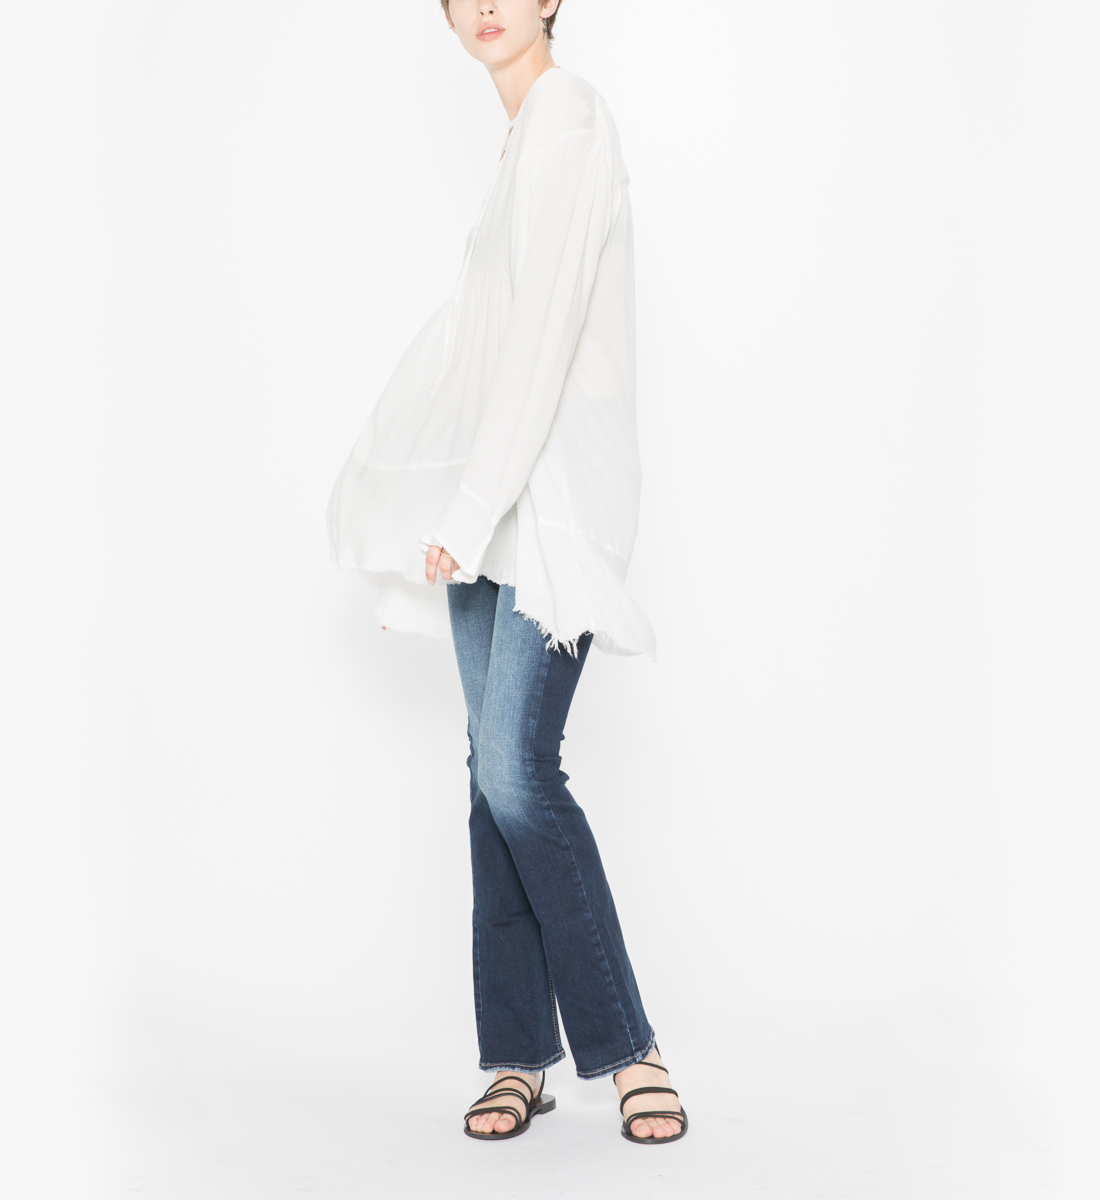 3a8f07e331e Sophia - Flowy Tunic Peasant Top, Cloud, hi-res. SKU # L18DT4021. Silver  Jeans